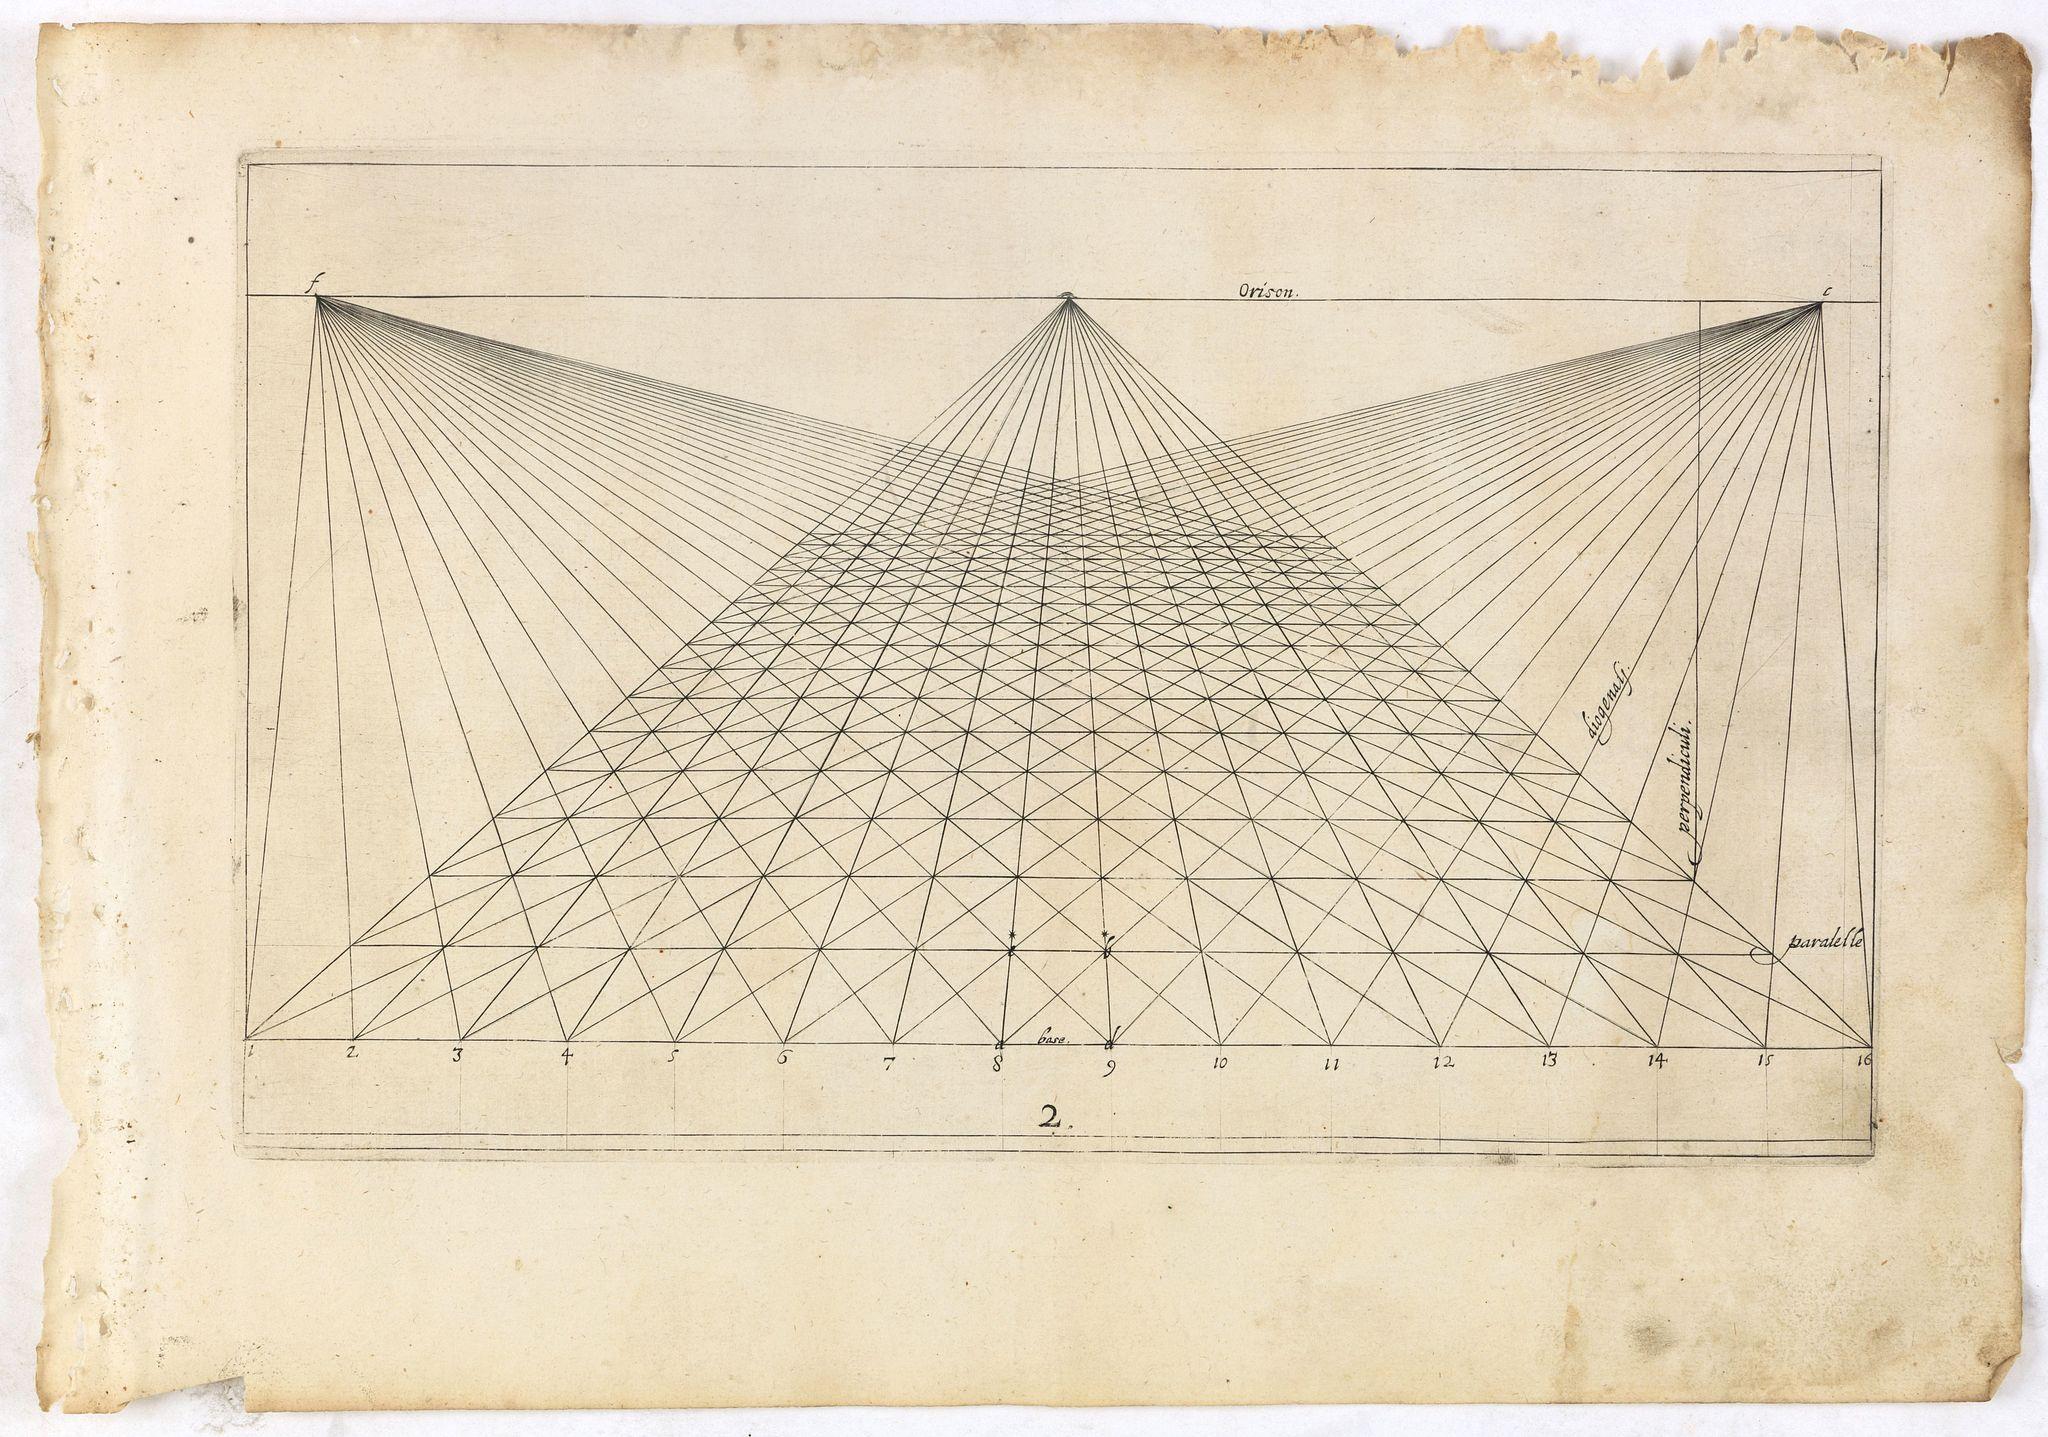 VREDEMAN DE VRIES, J. / HONDIUS, H. -  Perspective print by Vredeman de Vries. 2